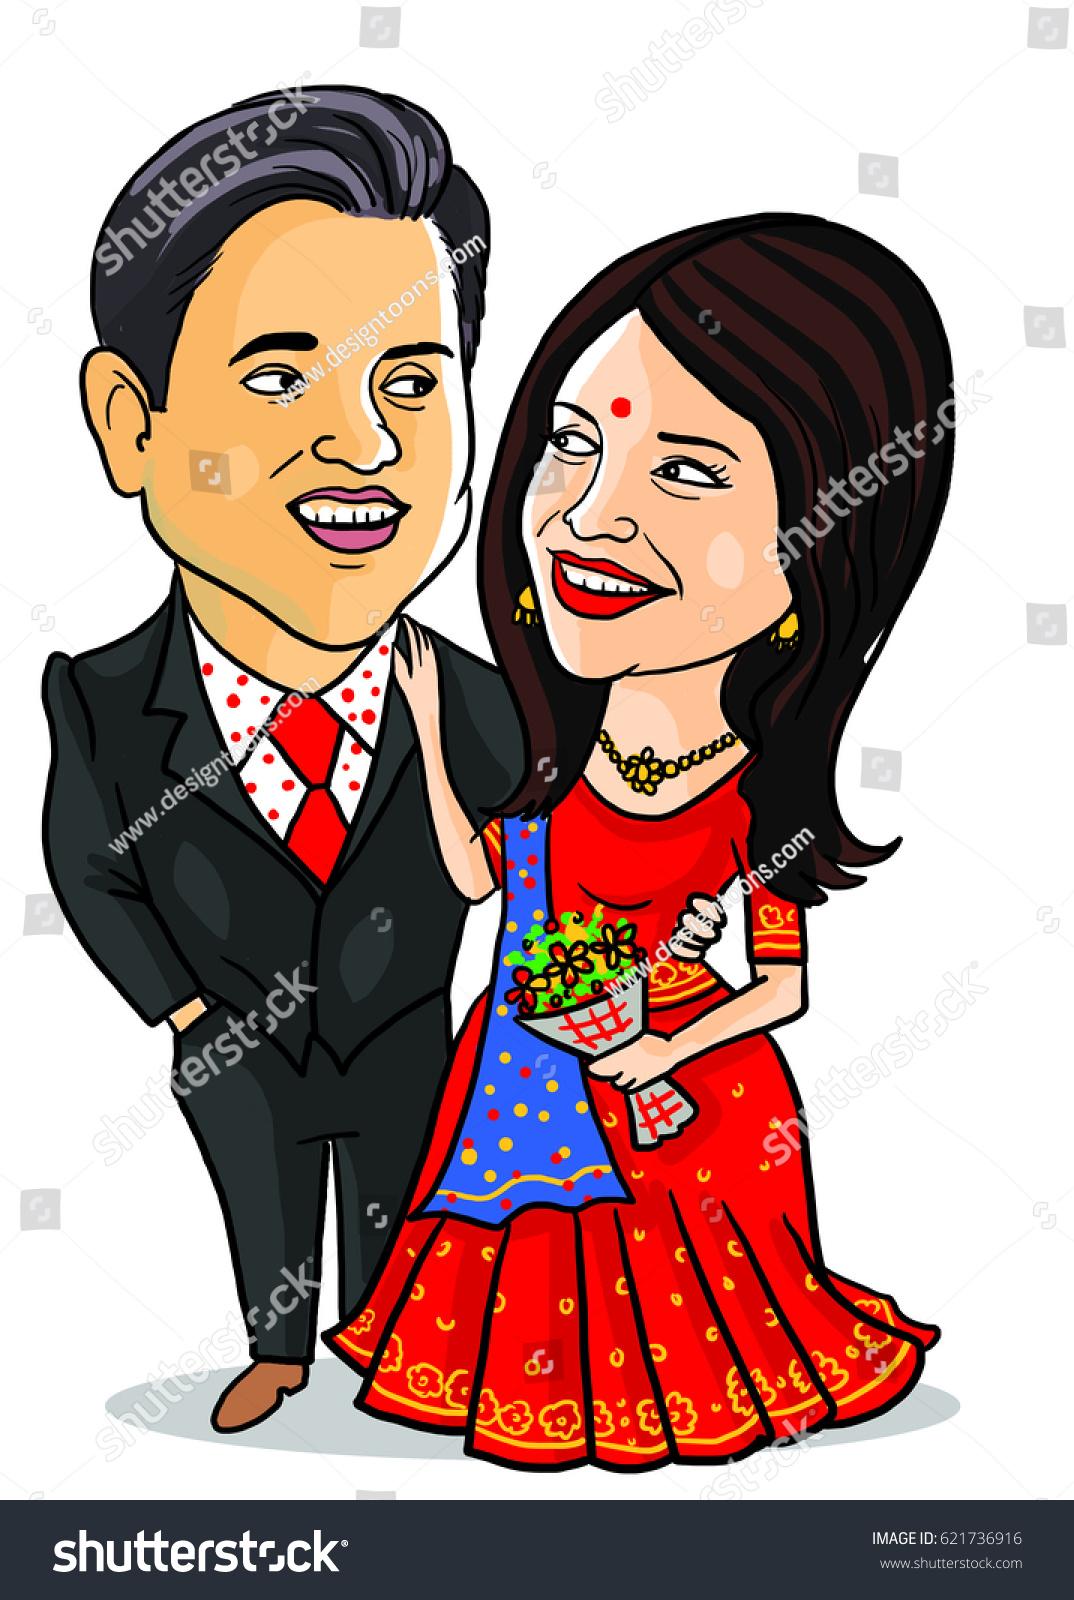 Wedding Caricature Stock Illustration 621736916 - Shutterstock